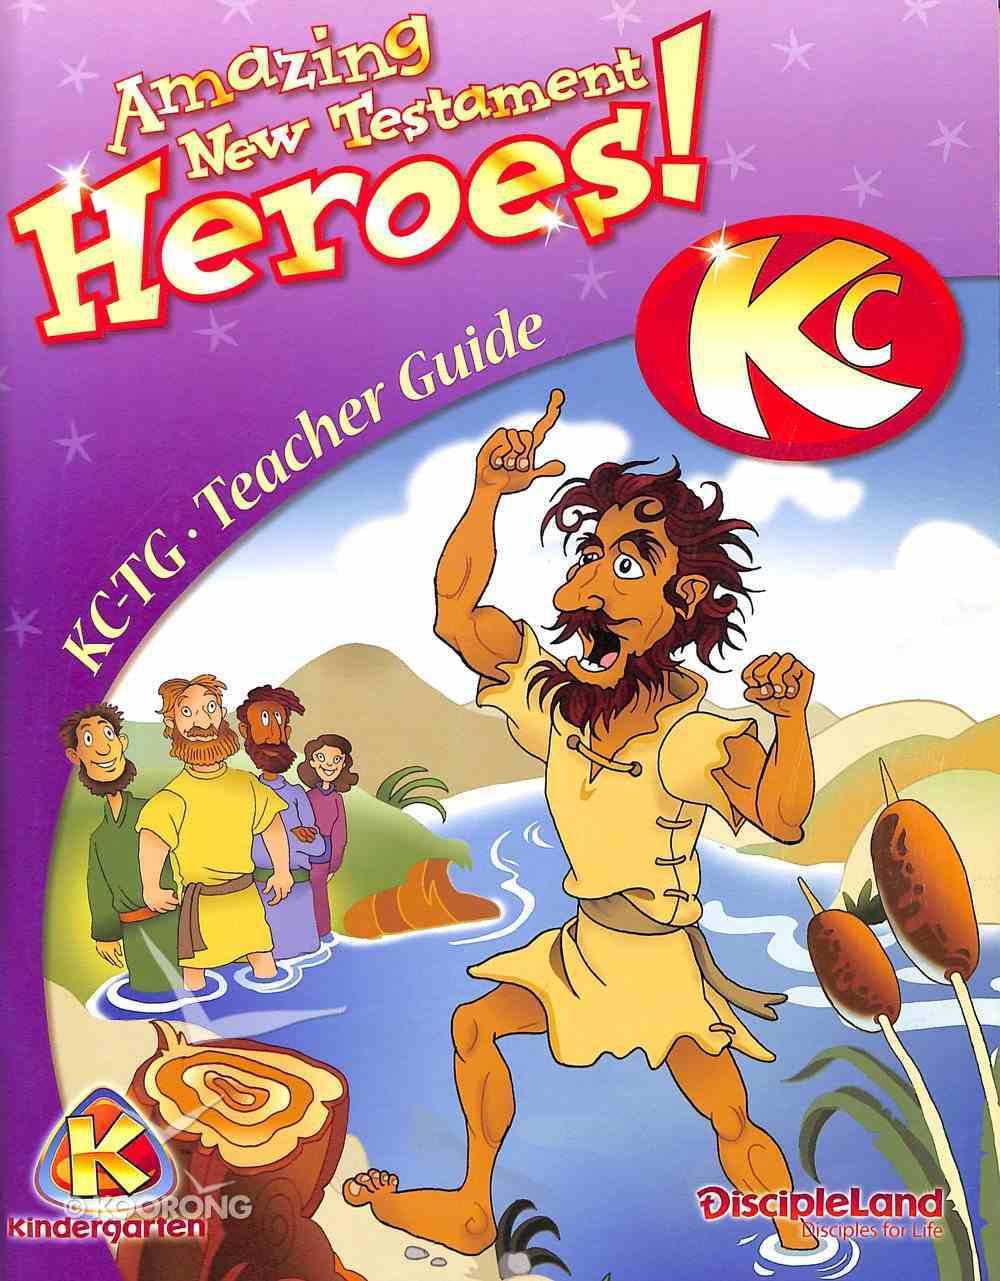 Dlc Kindergarten: Amazing N.T Heroes Ages 5-6 (Teacher) (Discipleland Kindergarten, Ages 5-6 Series) Paperback